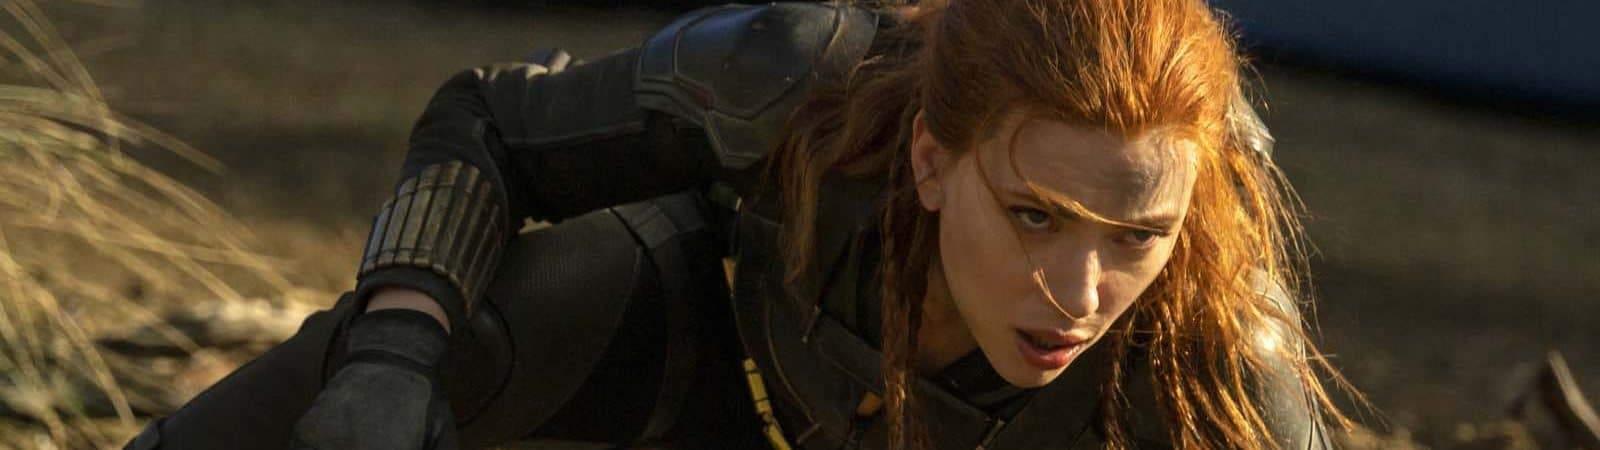 Natasha Romanoff (Scarlett Johansson) em cena do vindouro 'Viúva Negra'. Imagem: Jay Maidment/Marvel Studios